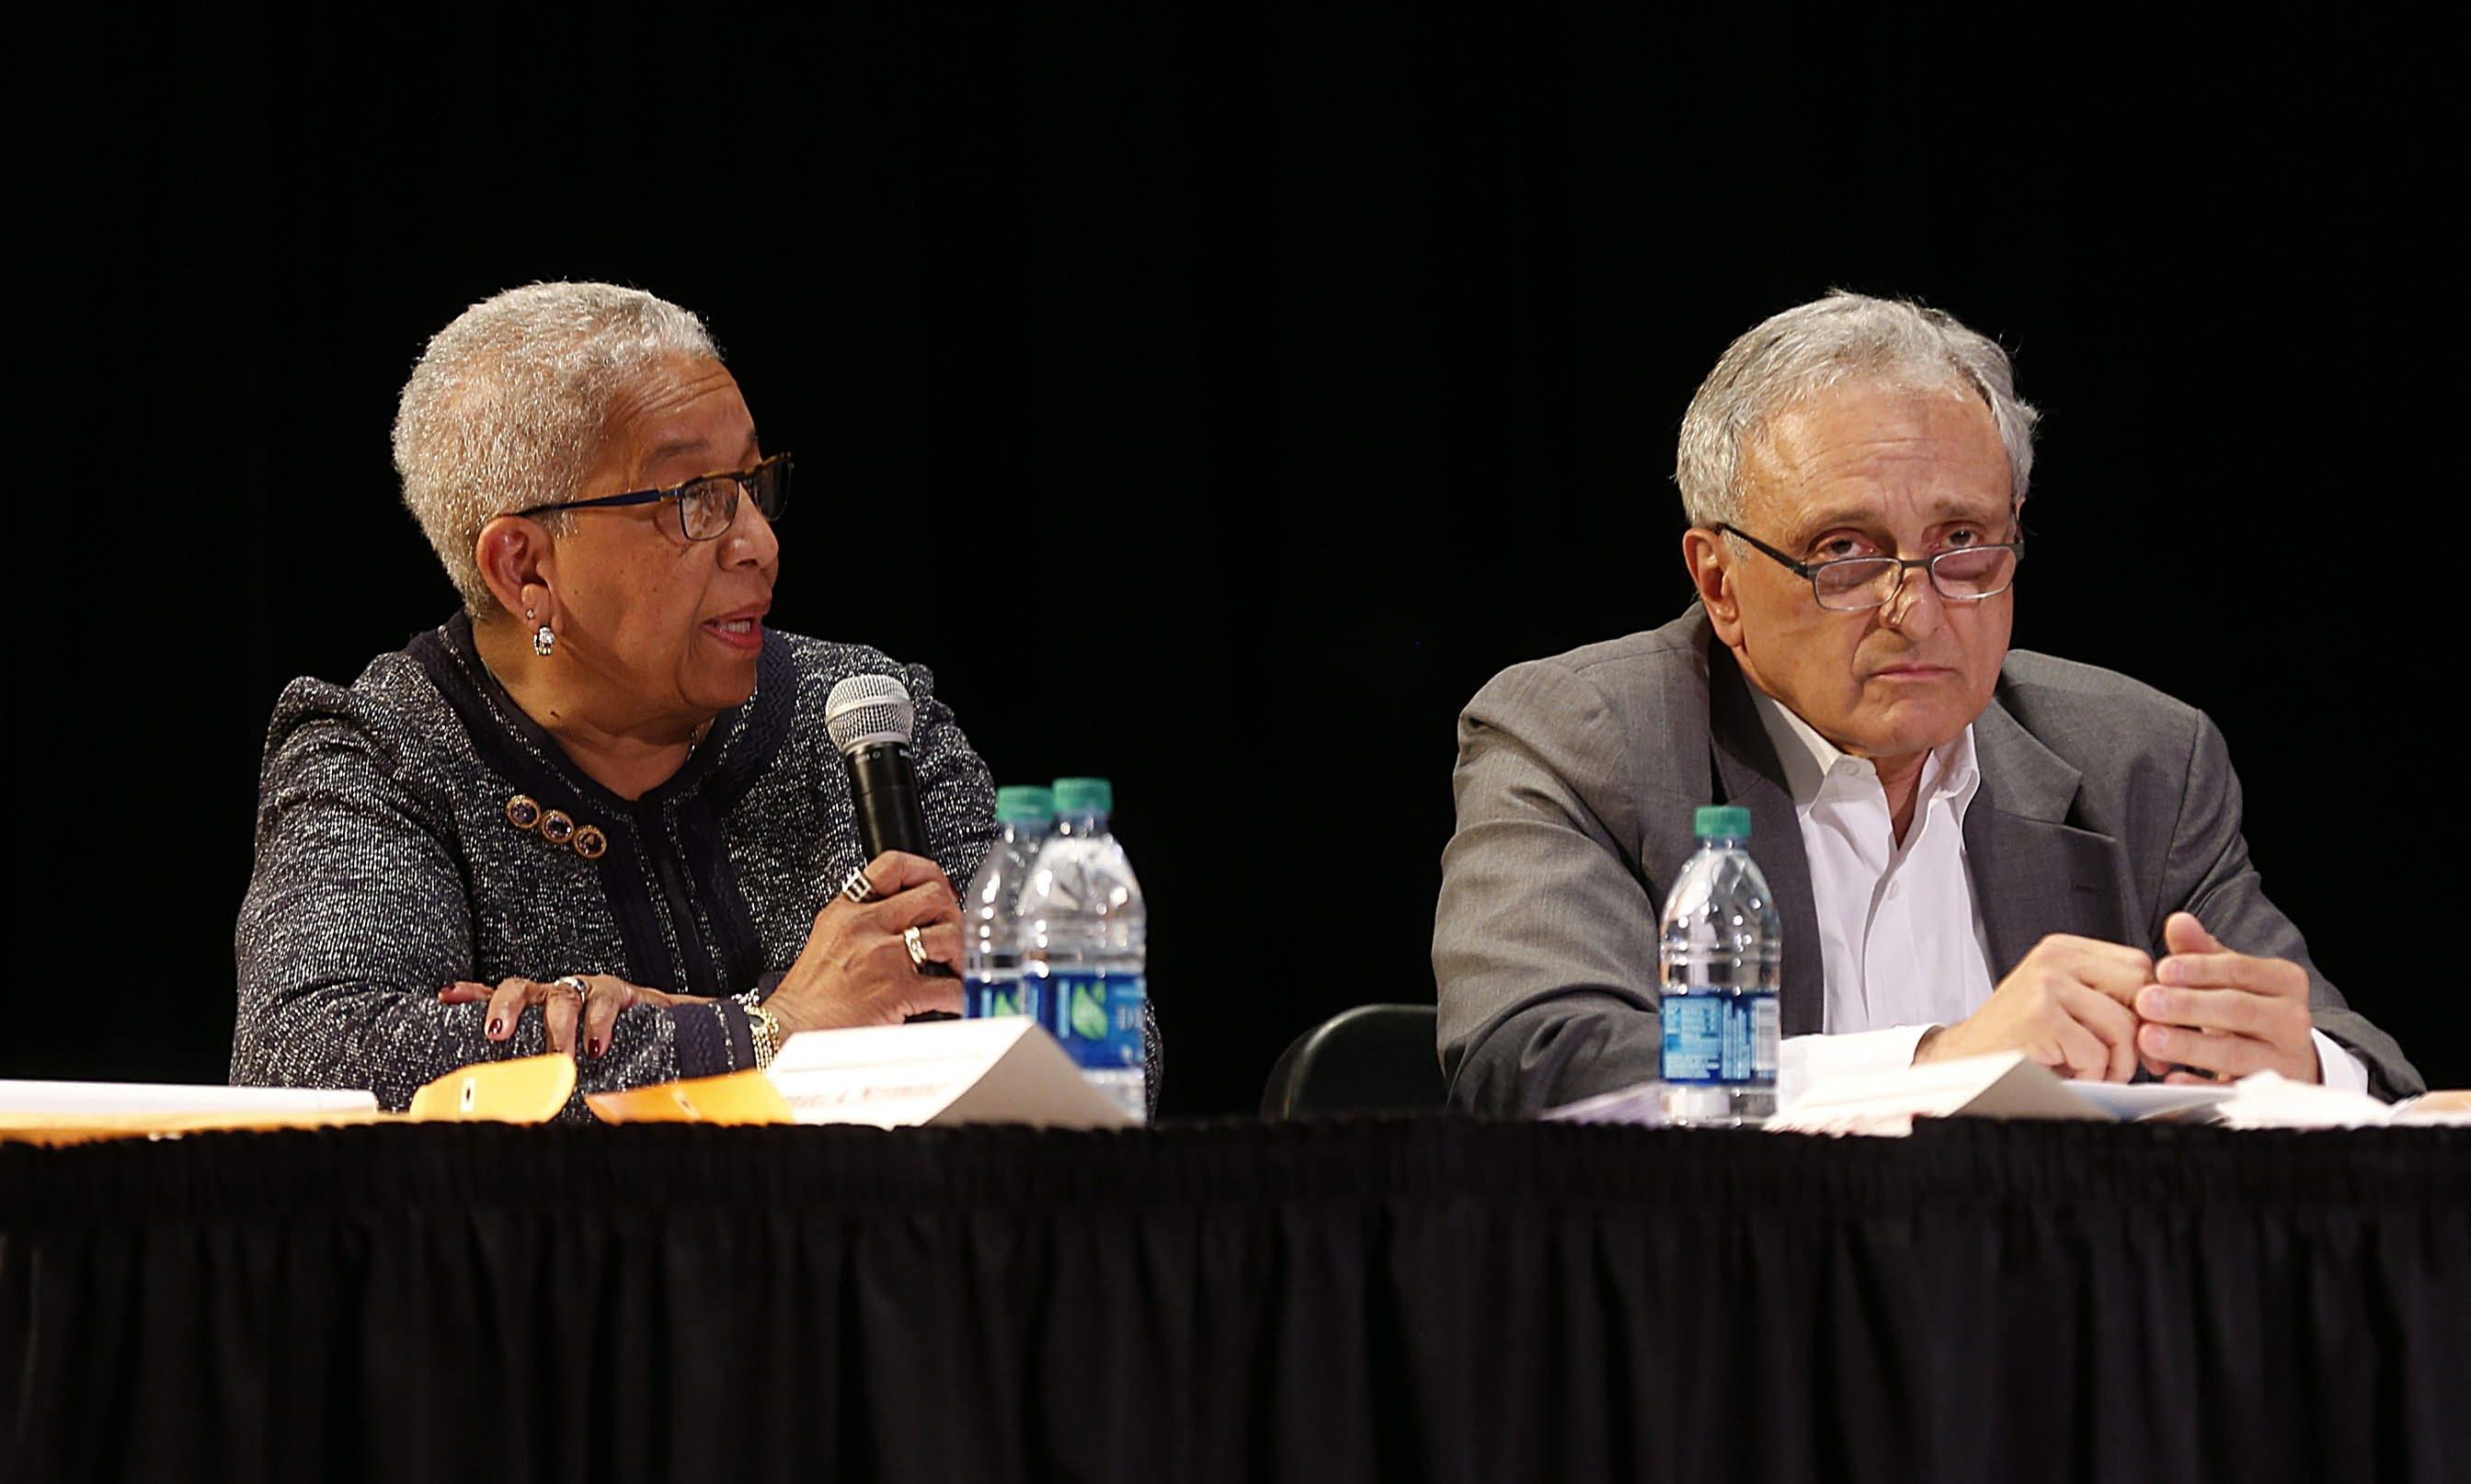 Buffalo School Board members Barbara Seals Nevergold and Carl Paladino have clashed often. (Robert Kirkham/Buffalo News file photo)